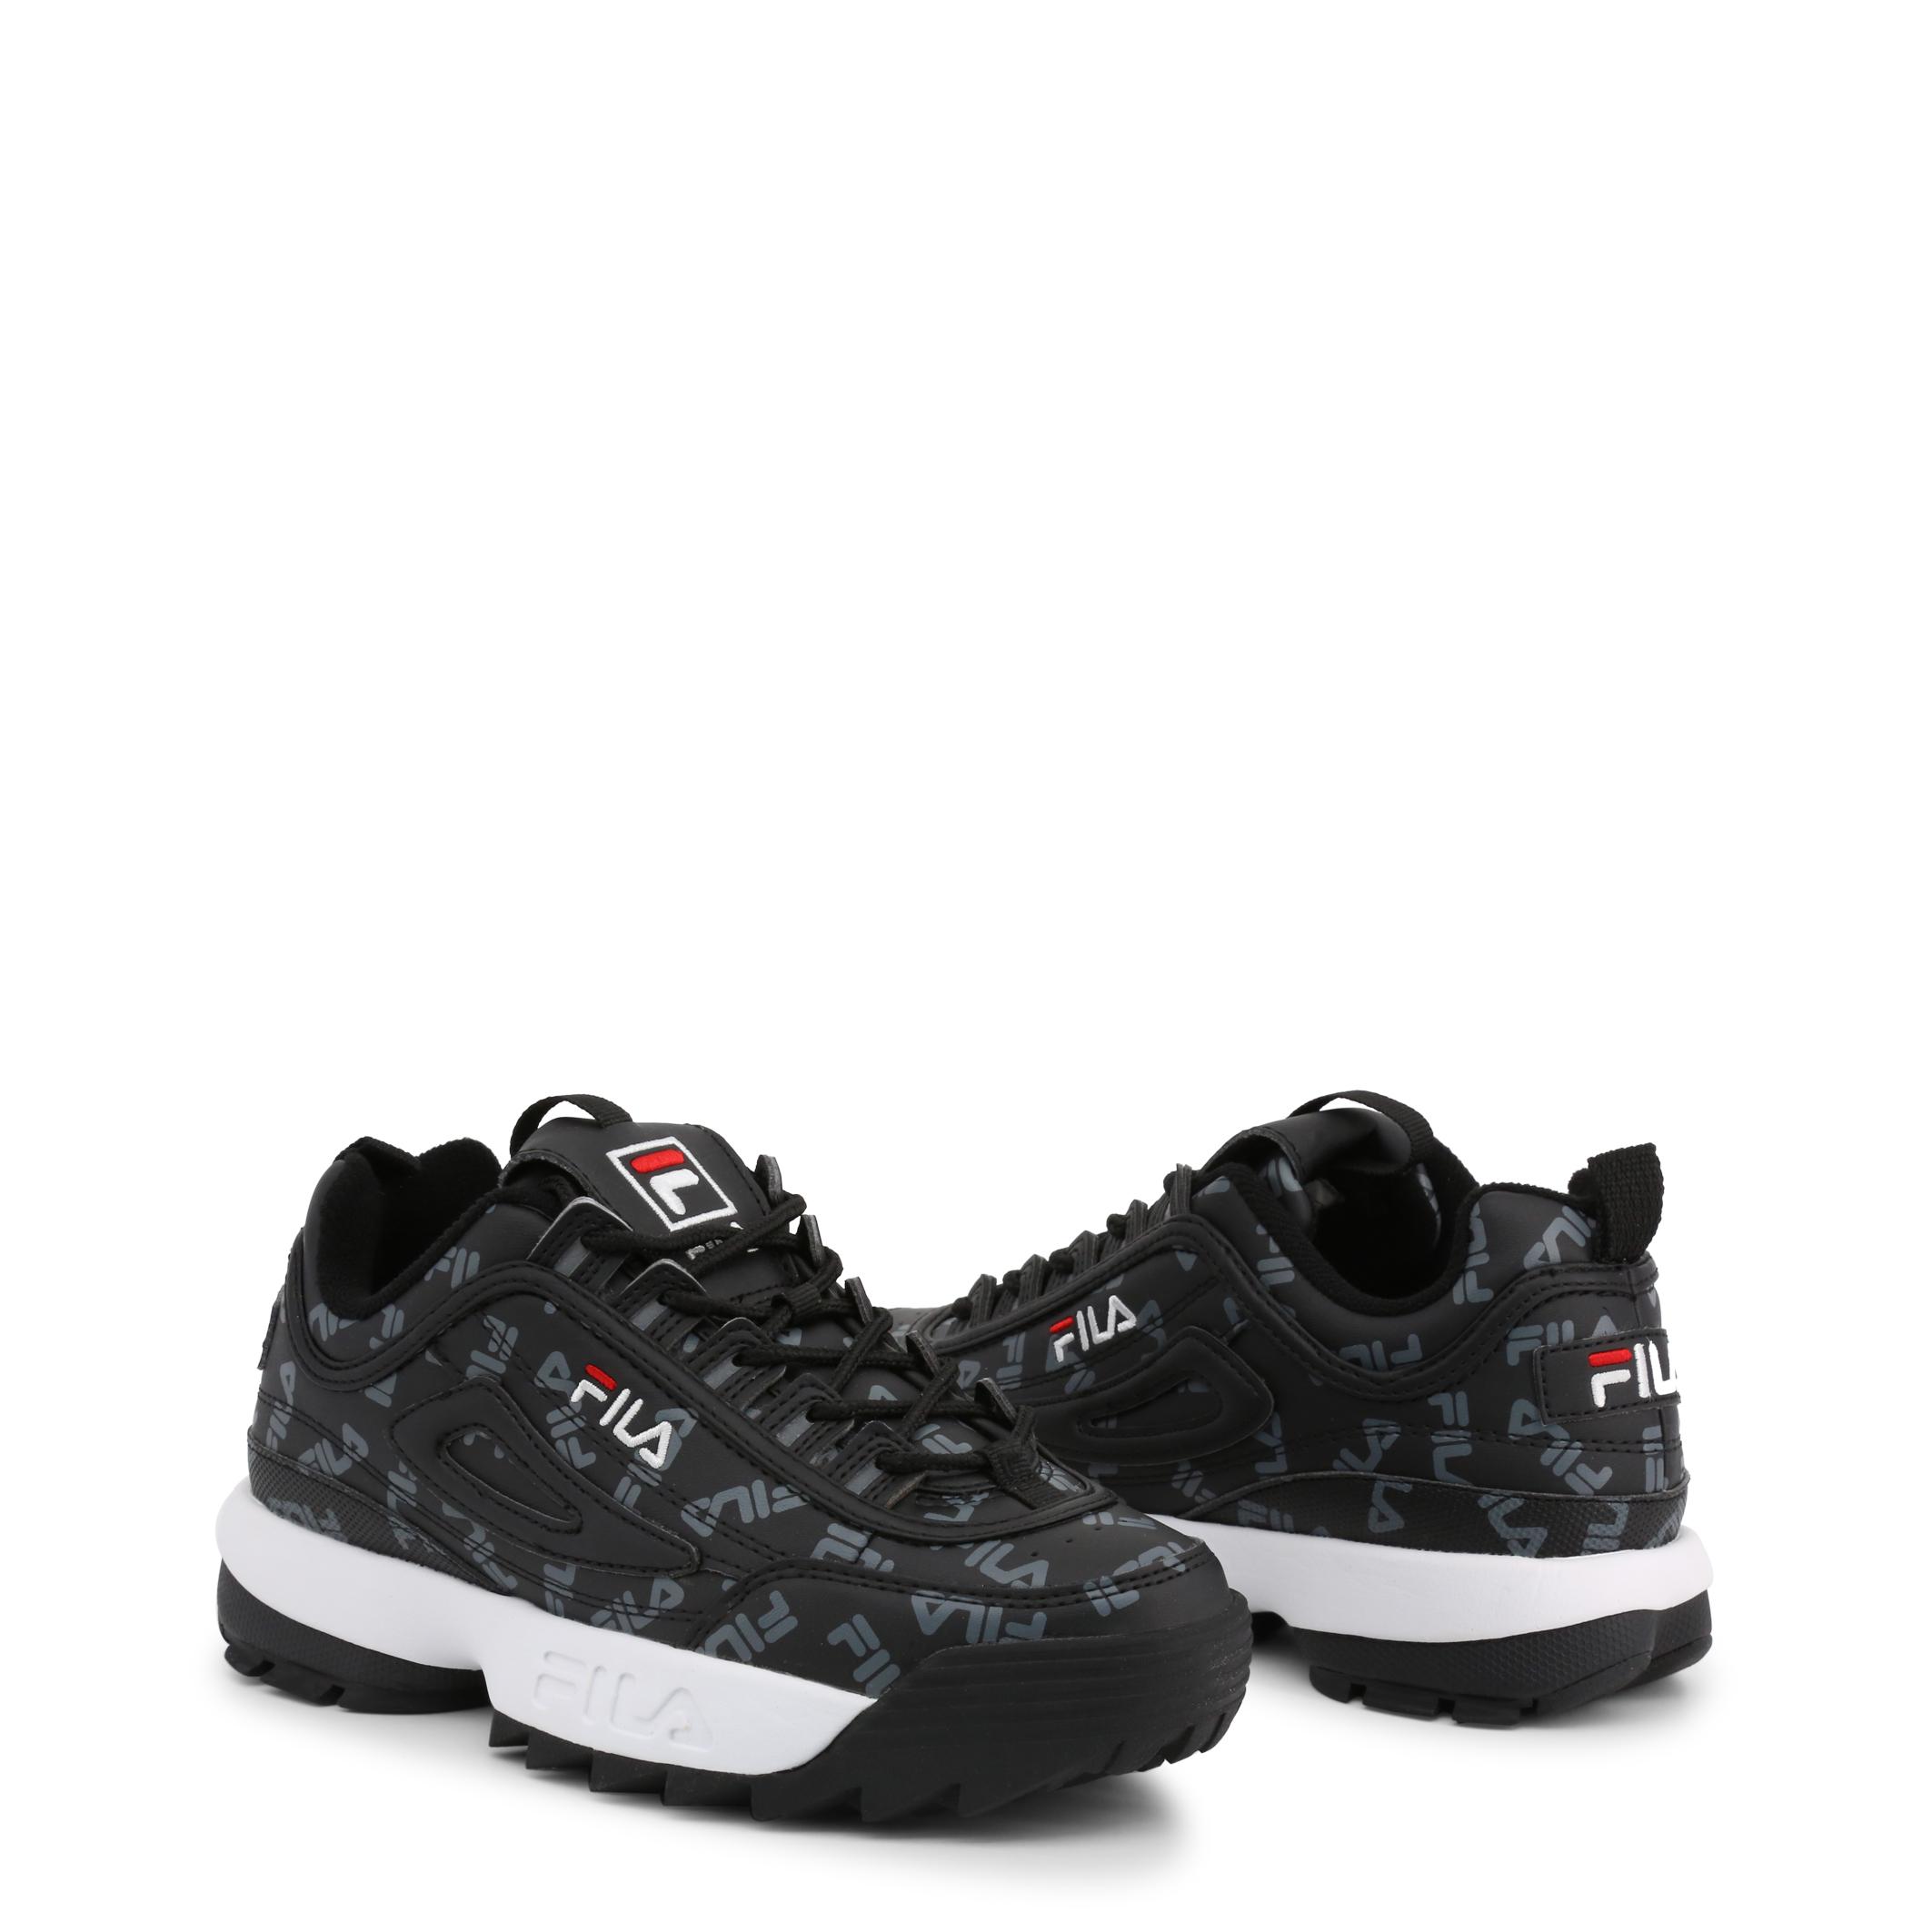 Chaussures Fila Baskets Femme Disruptor Logo Low_25Y Noir Black Original 2019   eBay